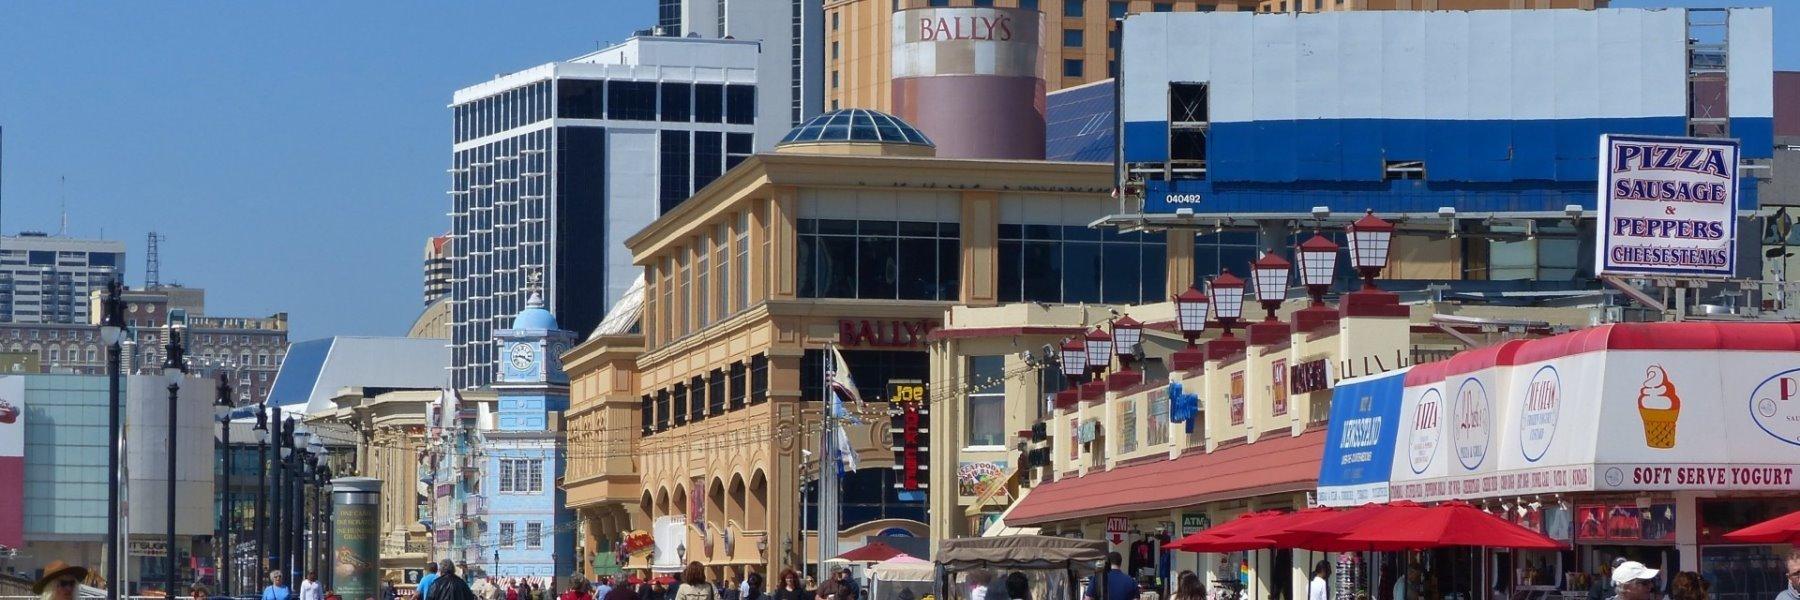 Beach House Rentals In Atlantic City Nj Part - 36: ... Atlantic City, NJ Rental Homes ...